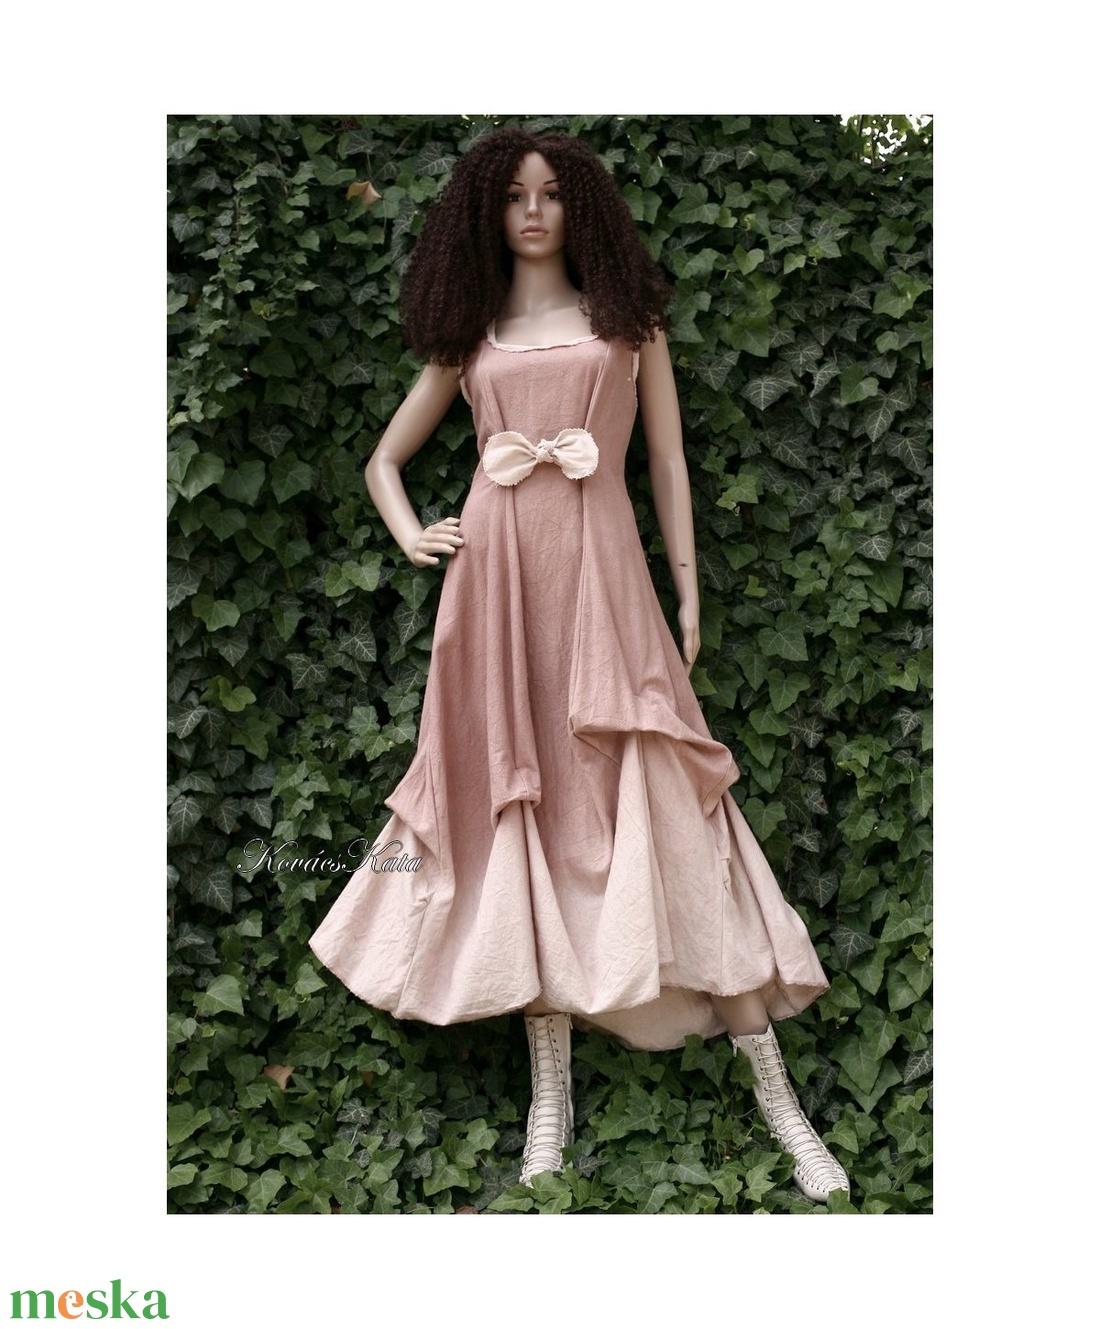 OPHÉLIA - artsy design-ruha - ruha & divat - női ruha - alkalmi ruha & estélyi ruha - Meska.hu